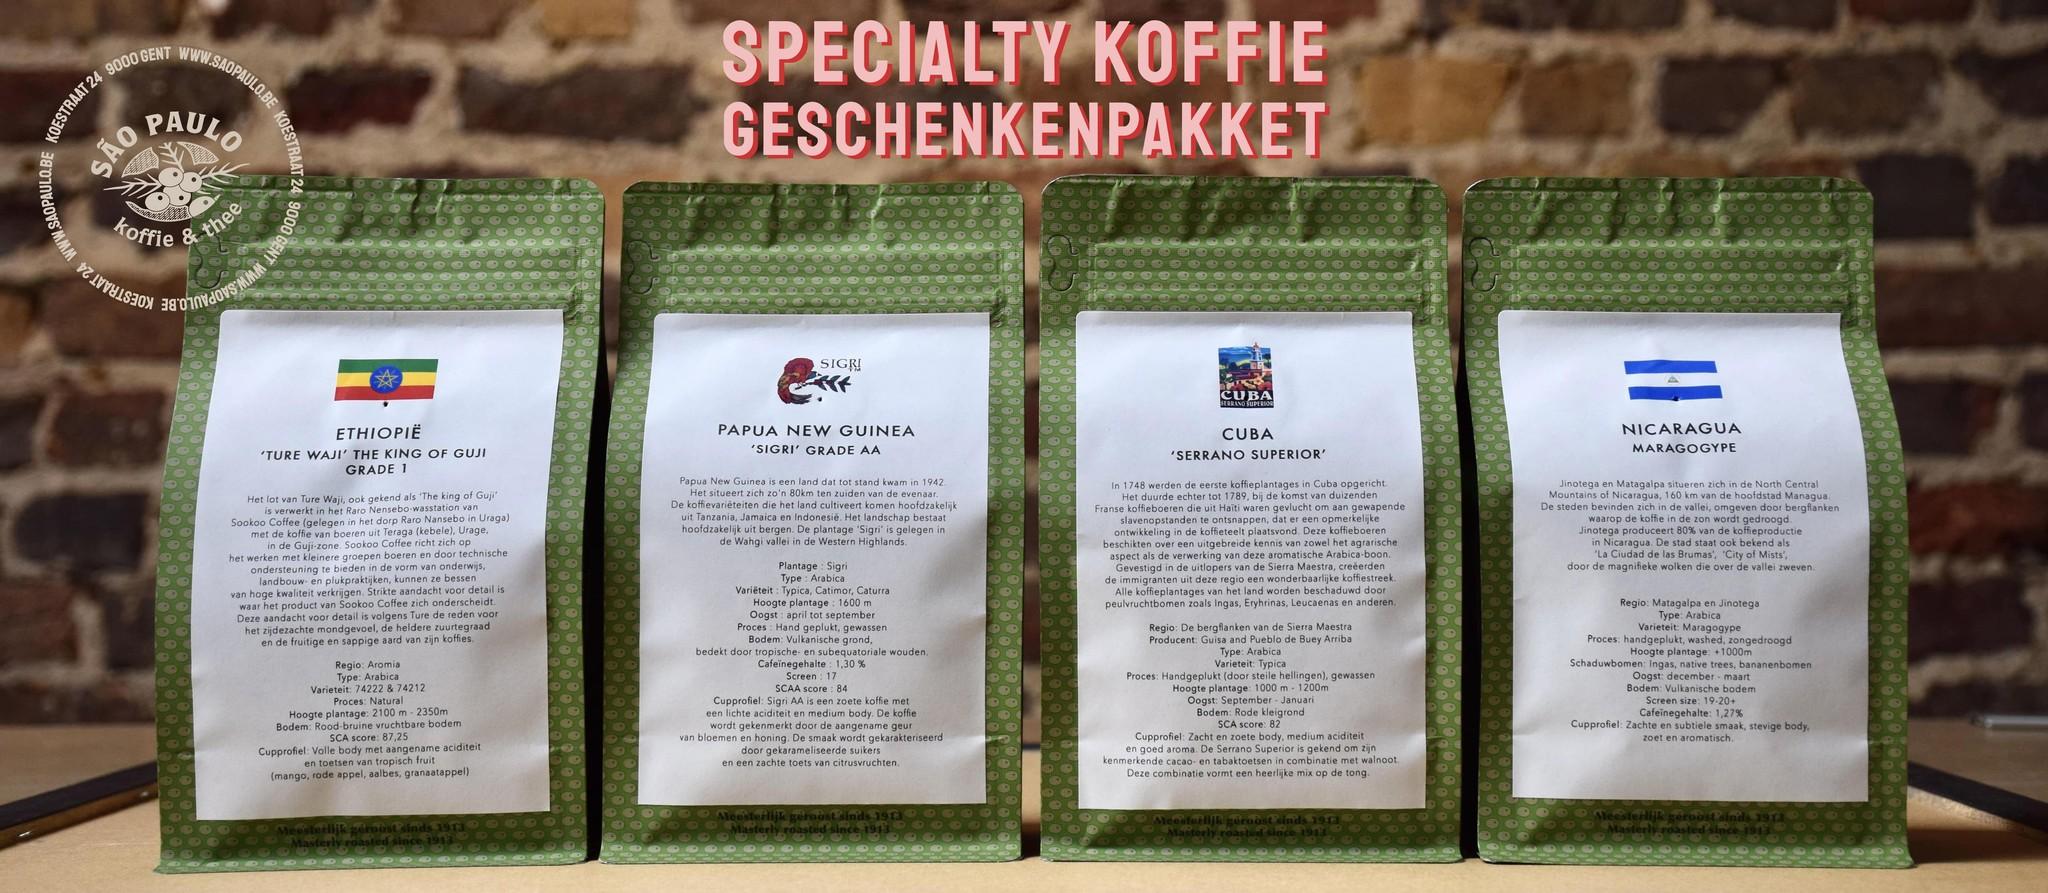 geschenkpakket koffie